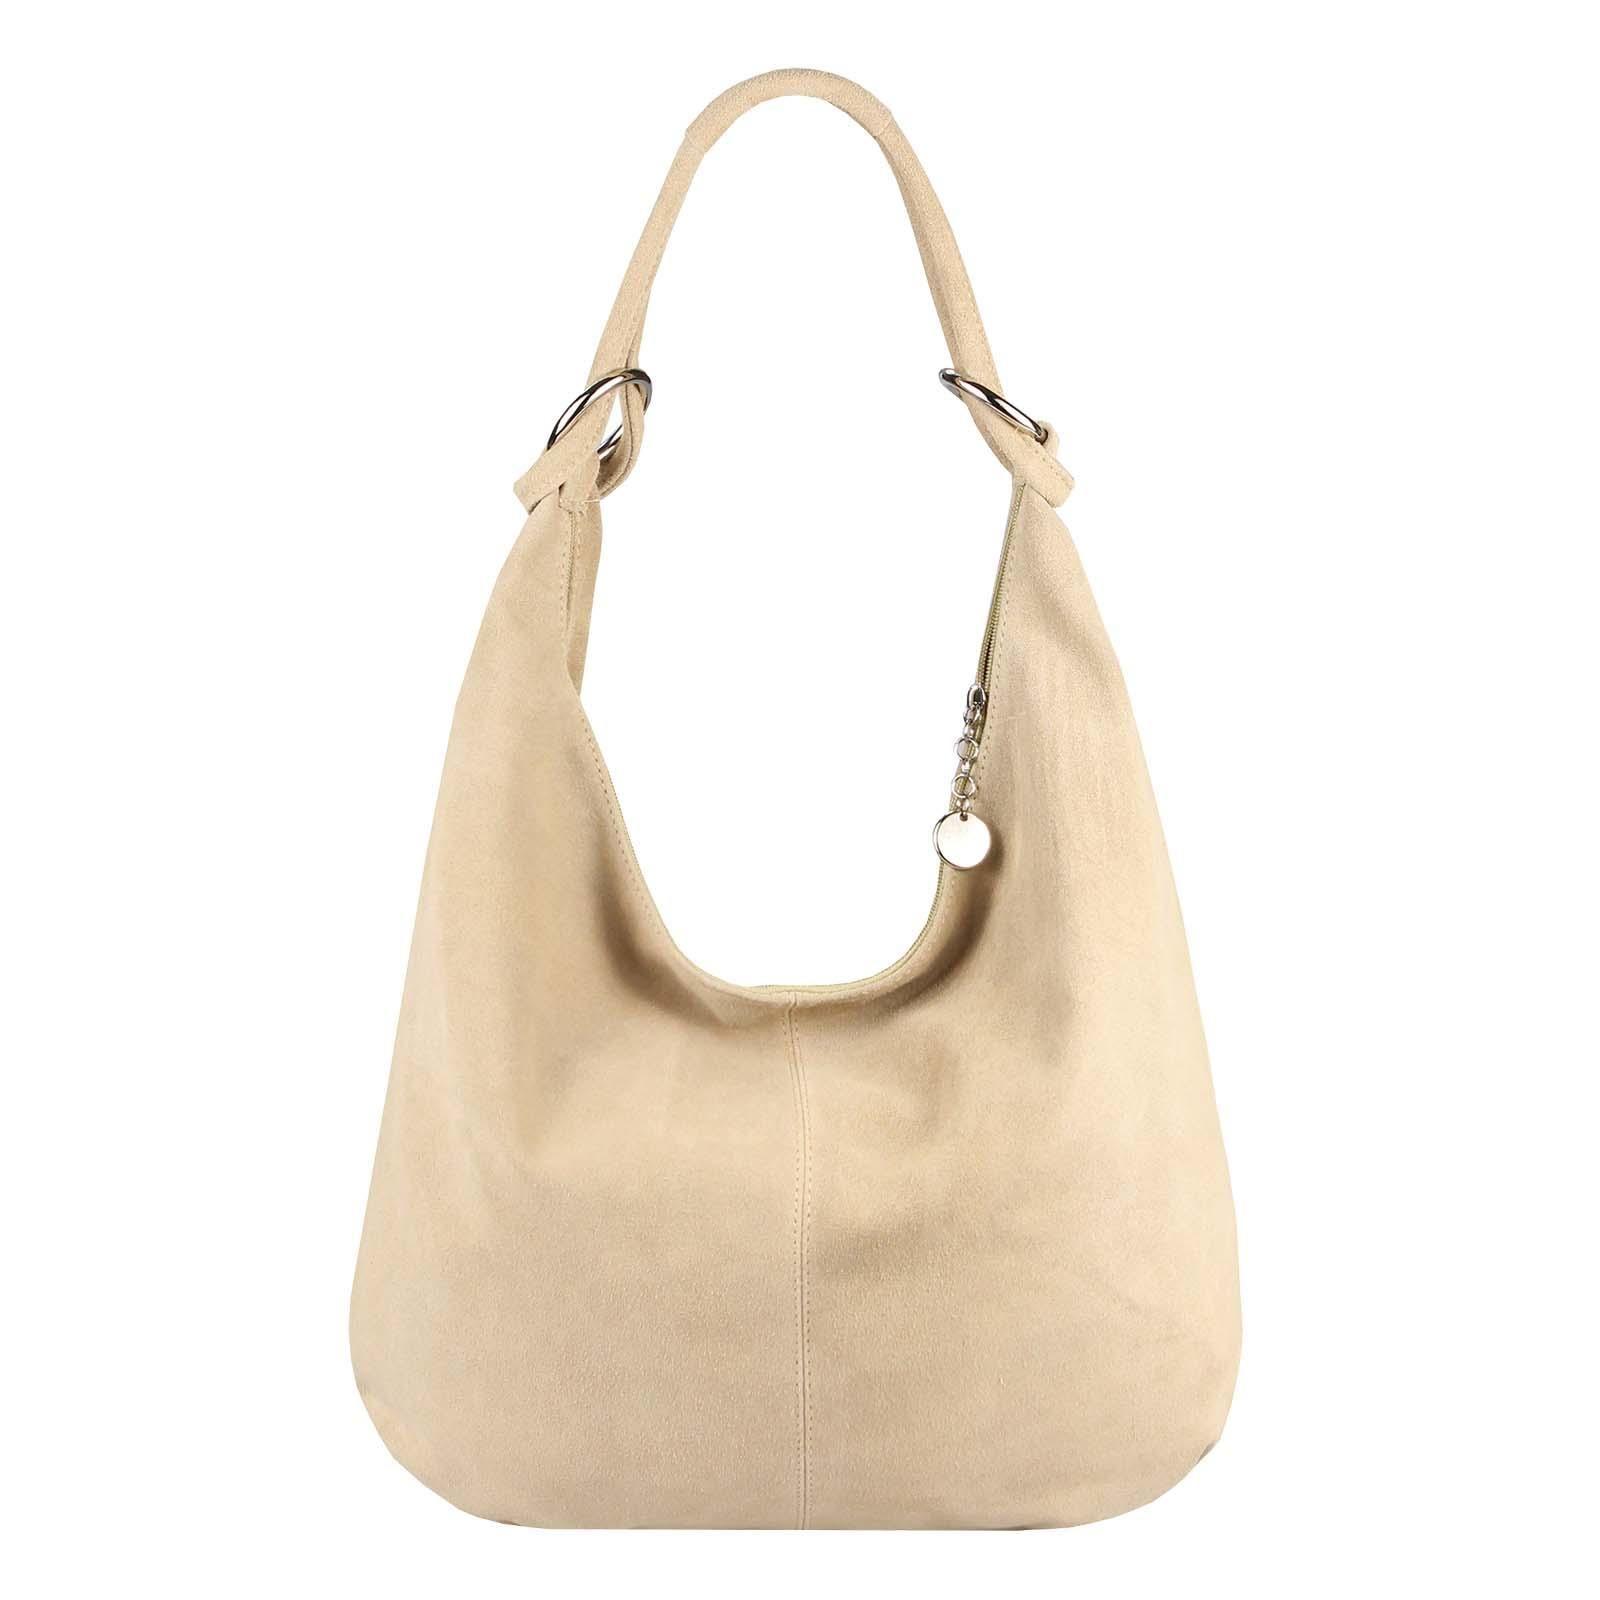 a33fb4072a57df Made in Italy Damen XXL Ledertasche Wildleder Shopper Tasche Schultertasche  Umhängetasche Hobo-Bag Beuteltasche